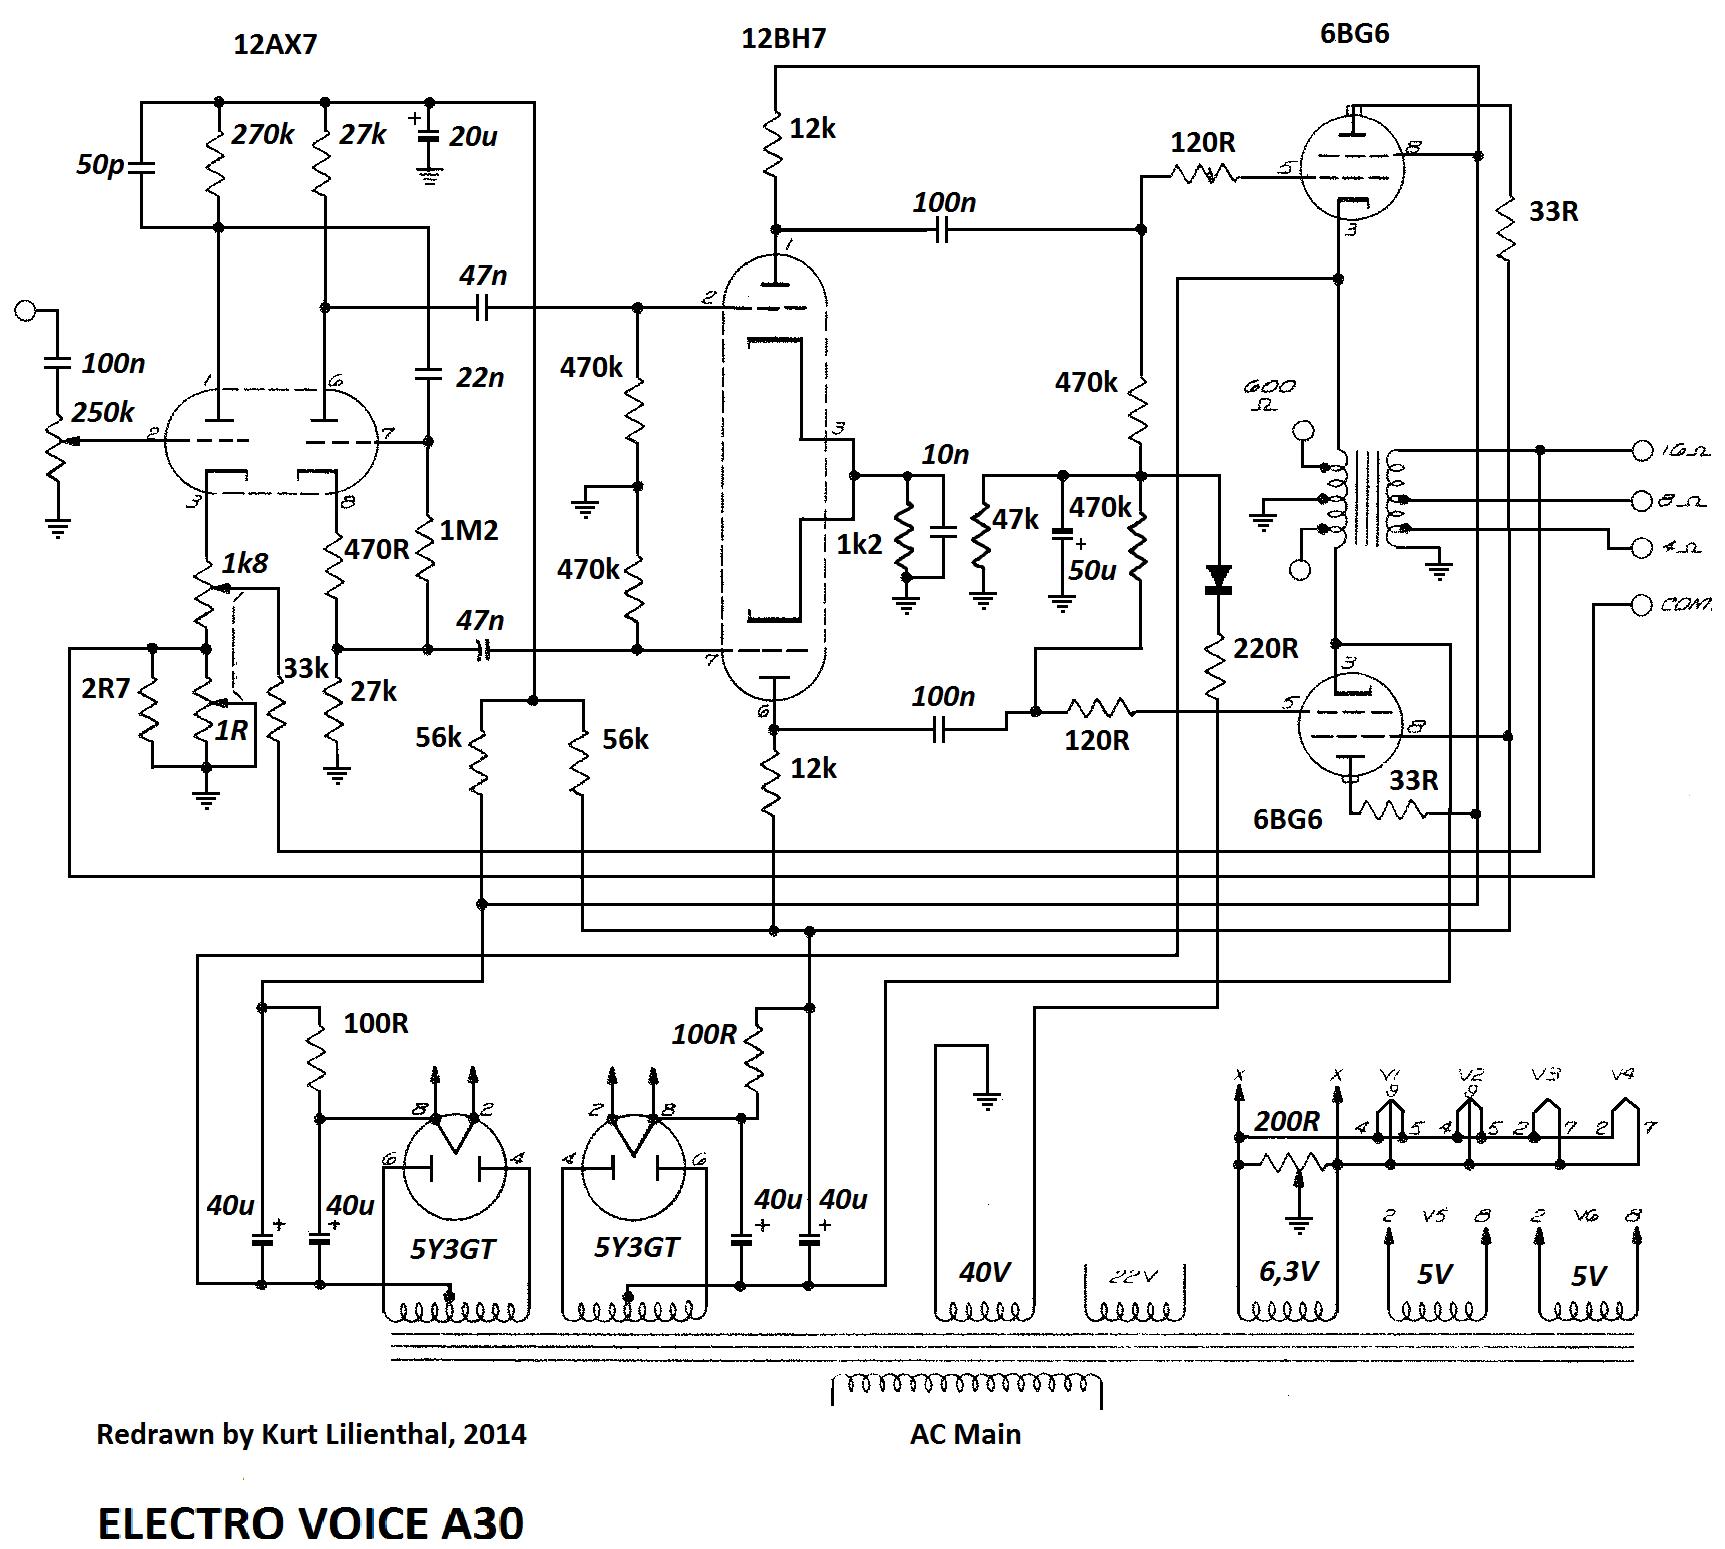 Electro Voice A30, 6BG6 PP, ed.